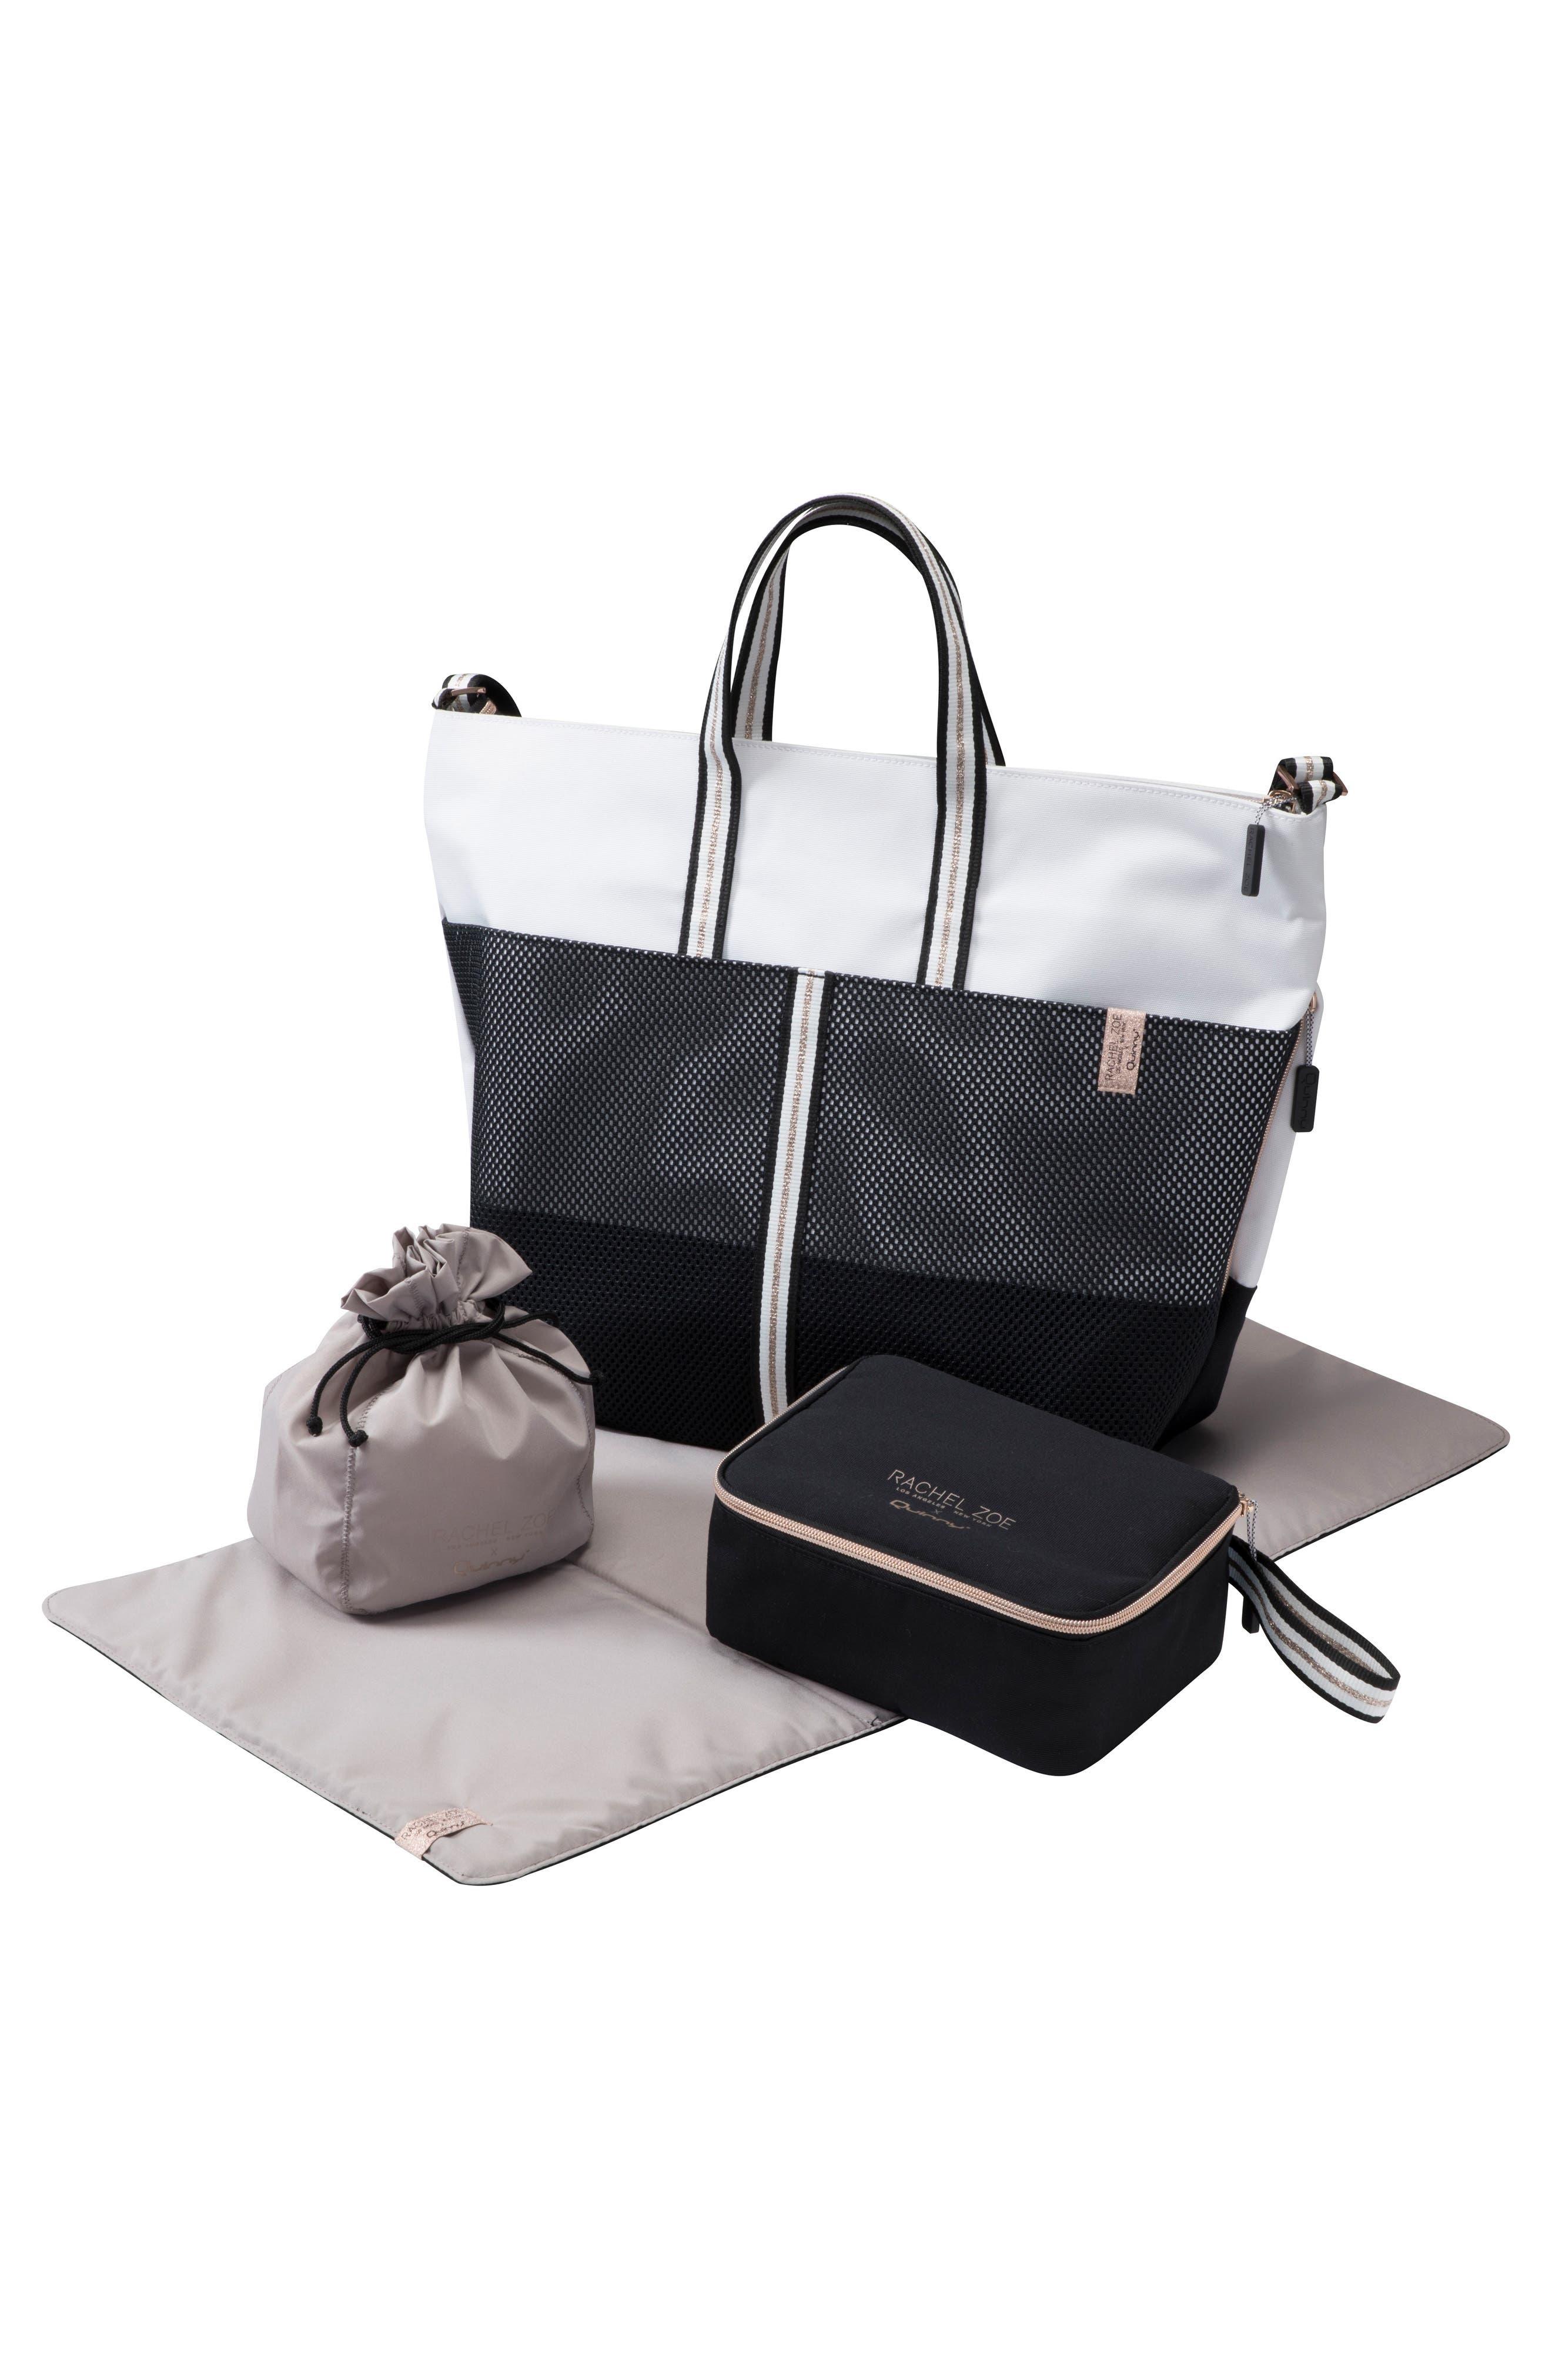 x Rachel Zoe Luxe Sport Diaper Bag,                             Alternate thumbnail 5, color,                             RZ LUXE SPORT